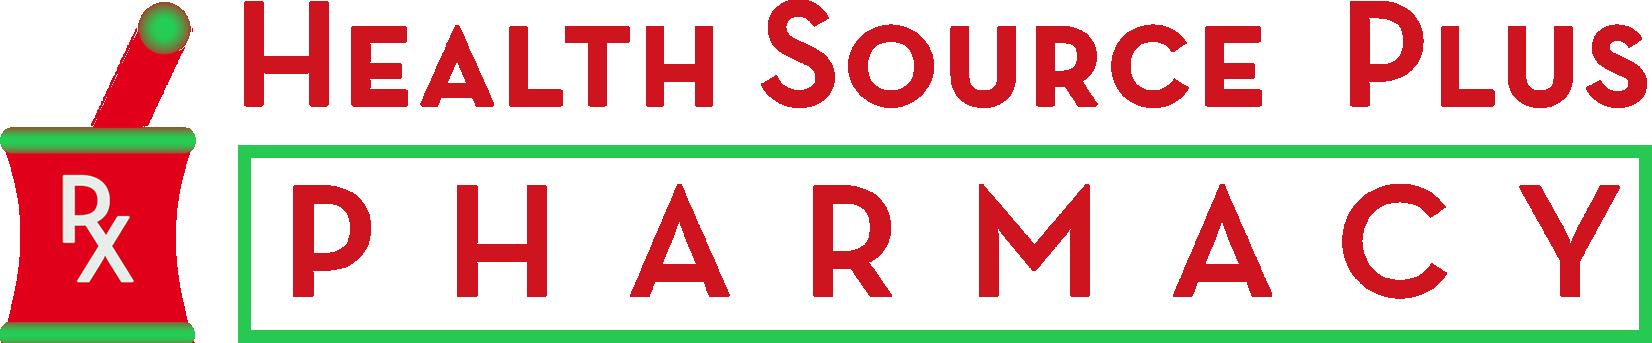 Health Source Plus Pharmacy